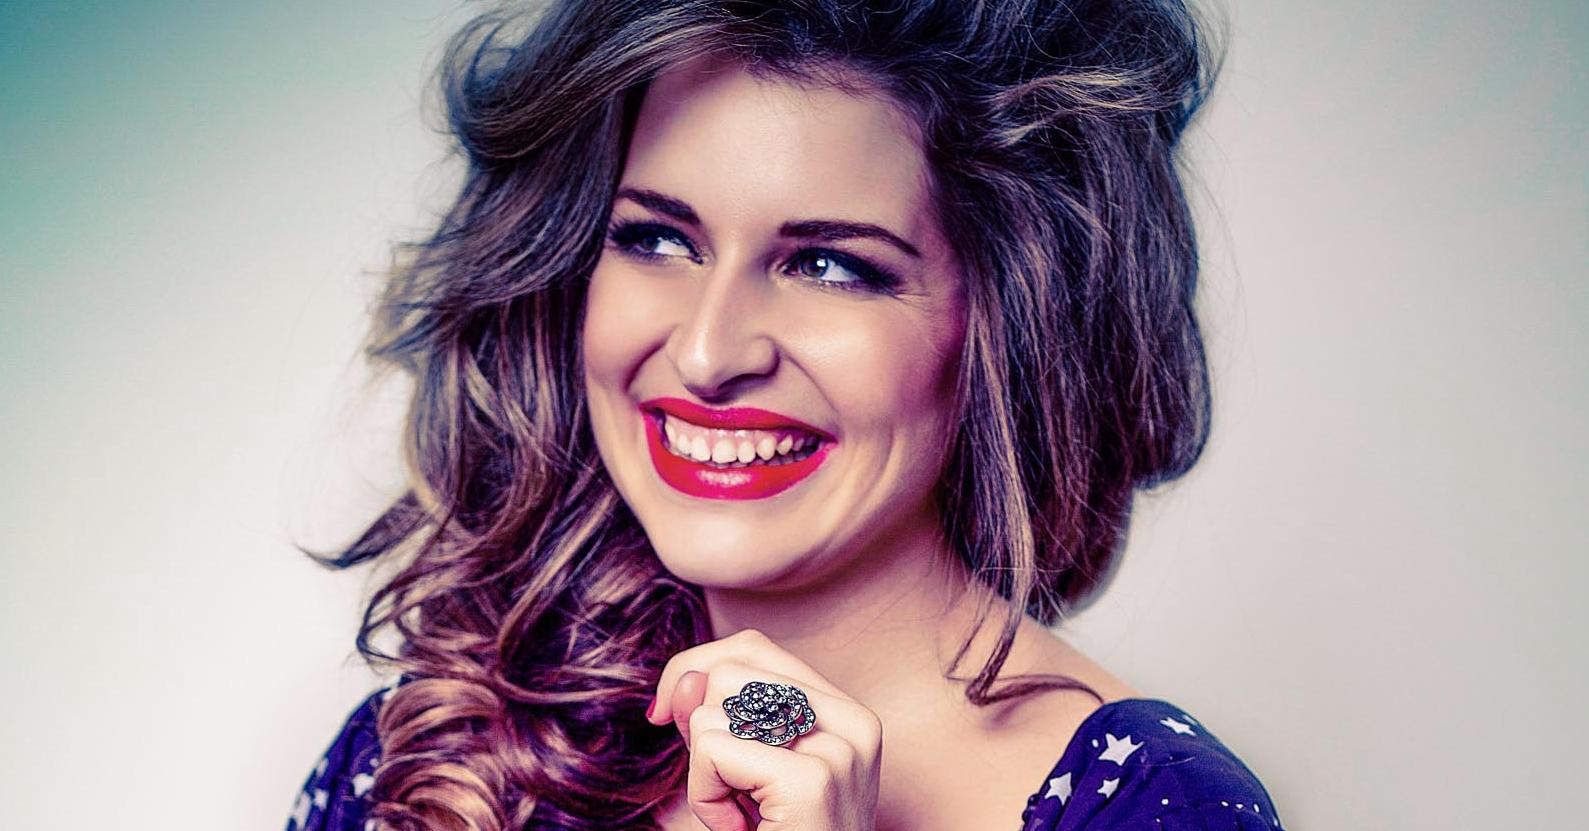 zangeres Meike van der Veer persfoto lachend